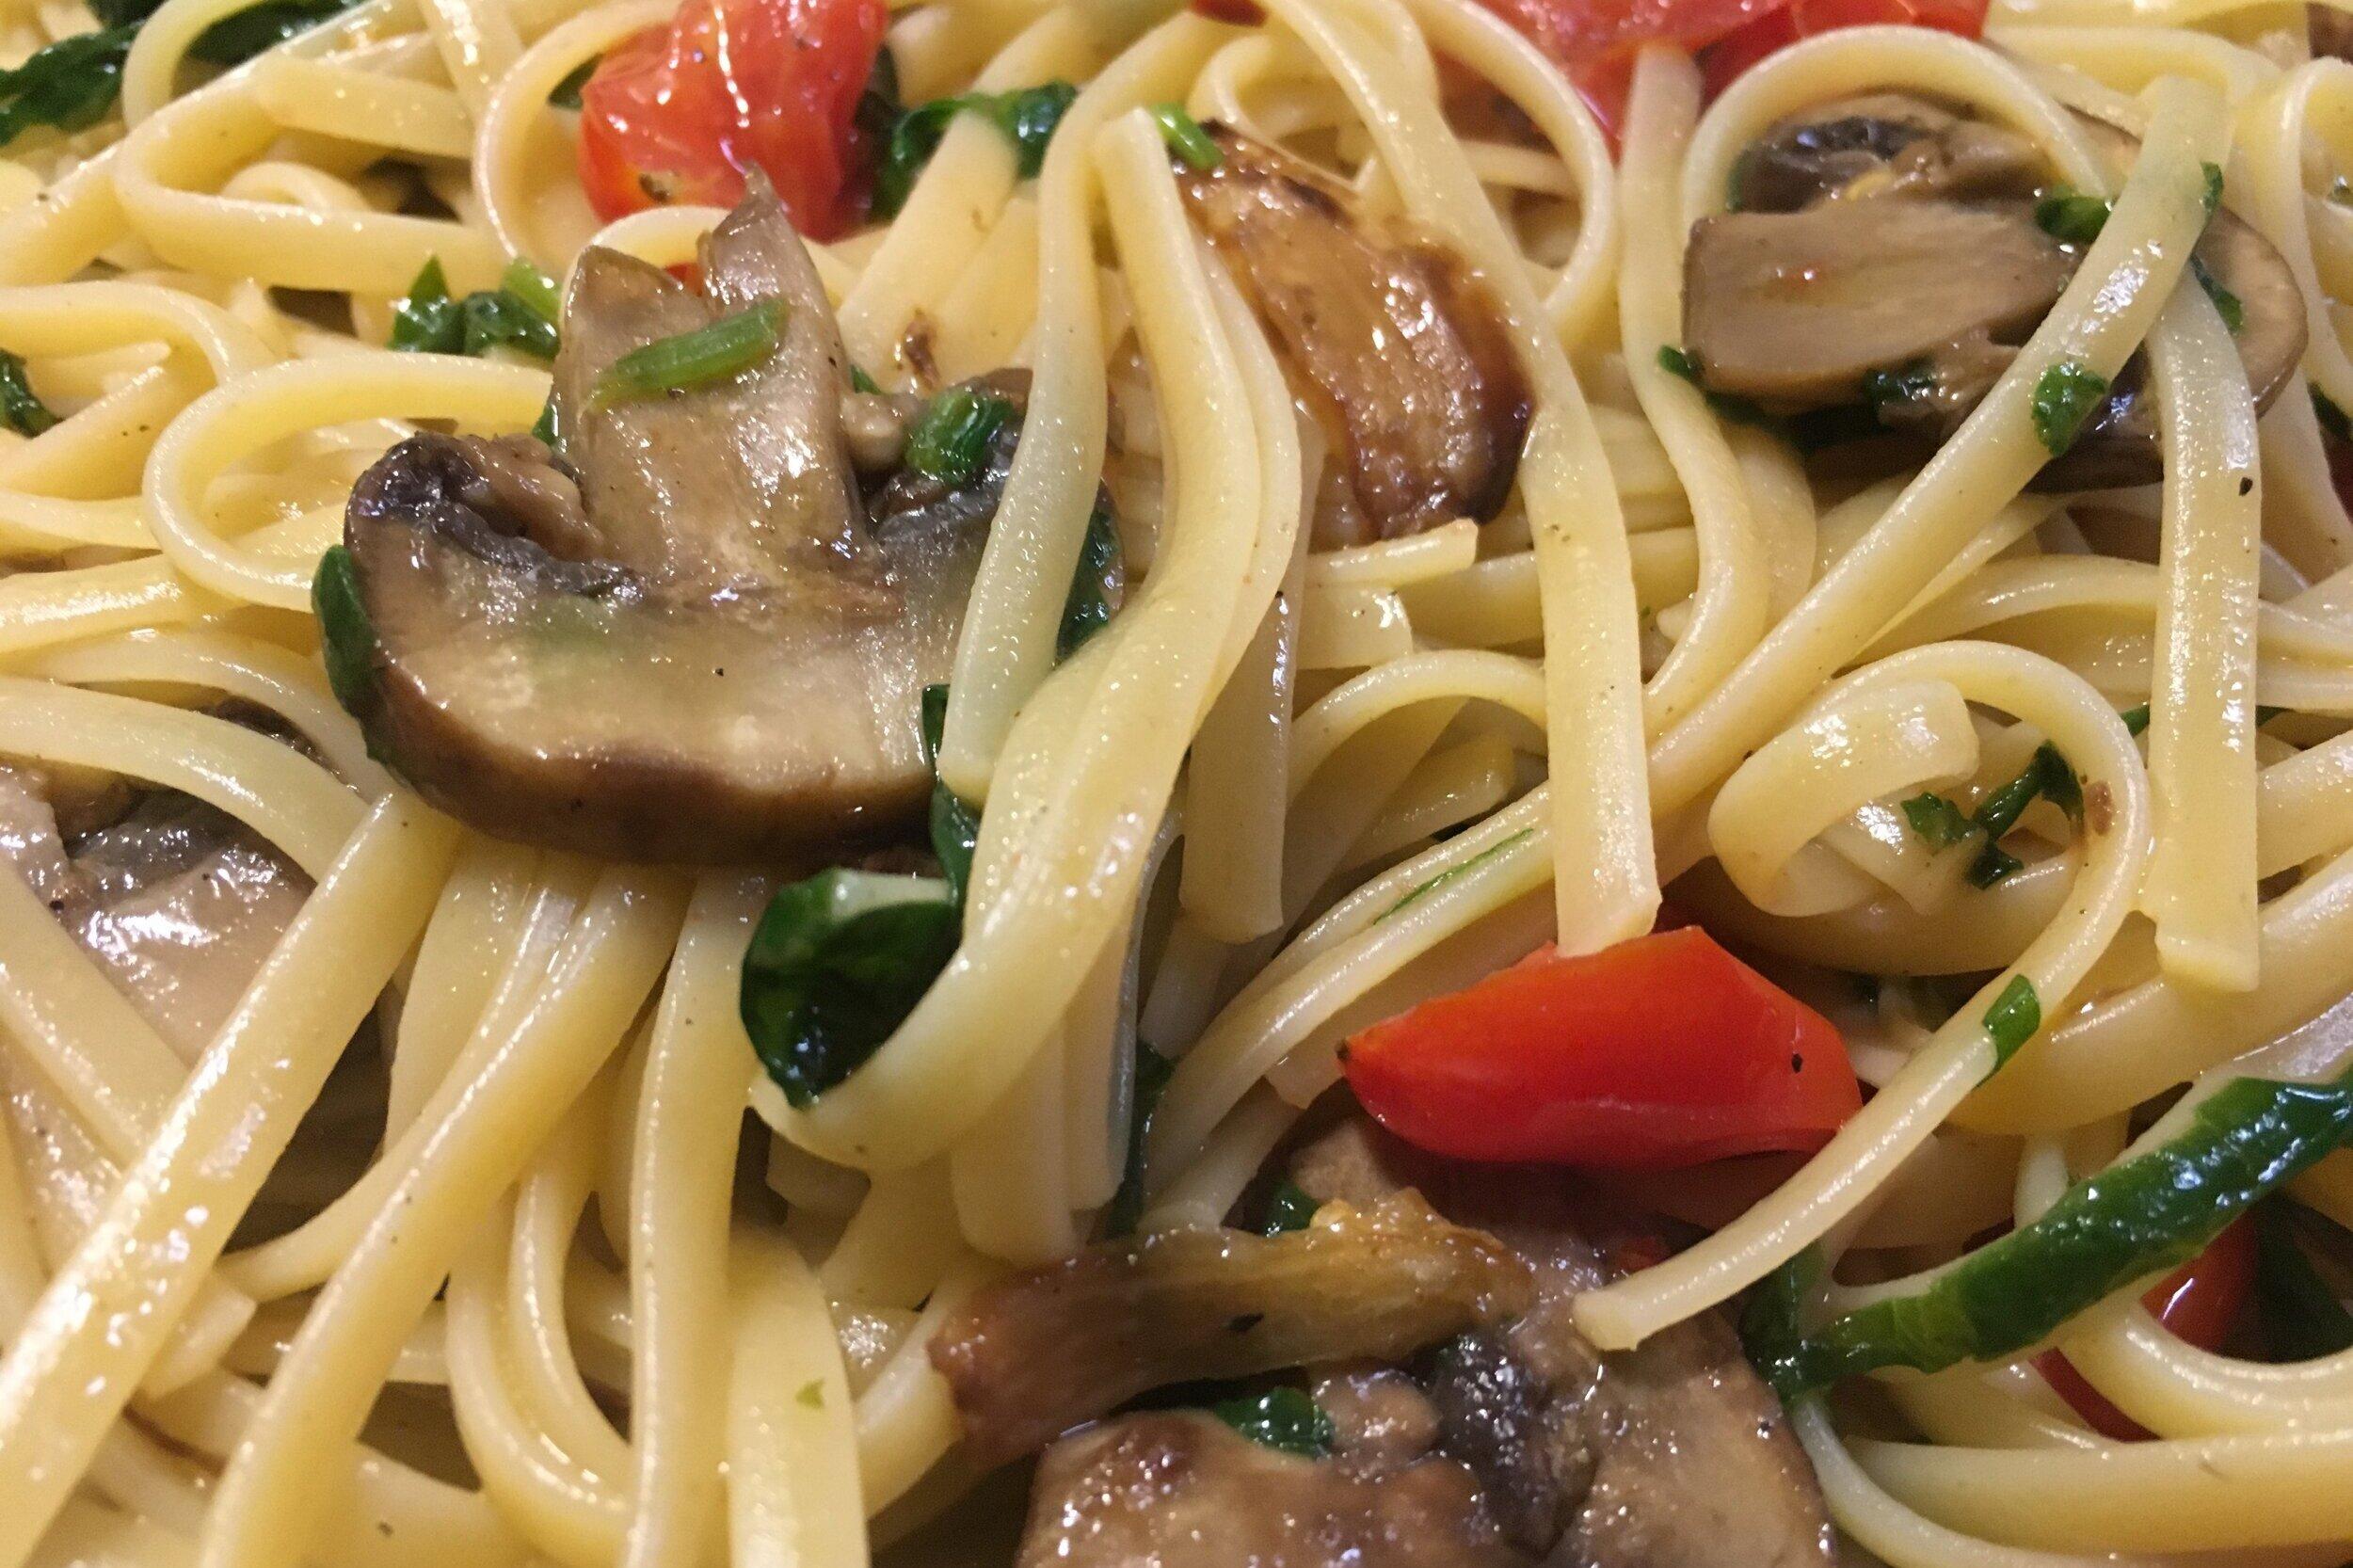 Pasta w/veggies